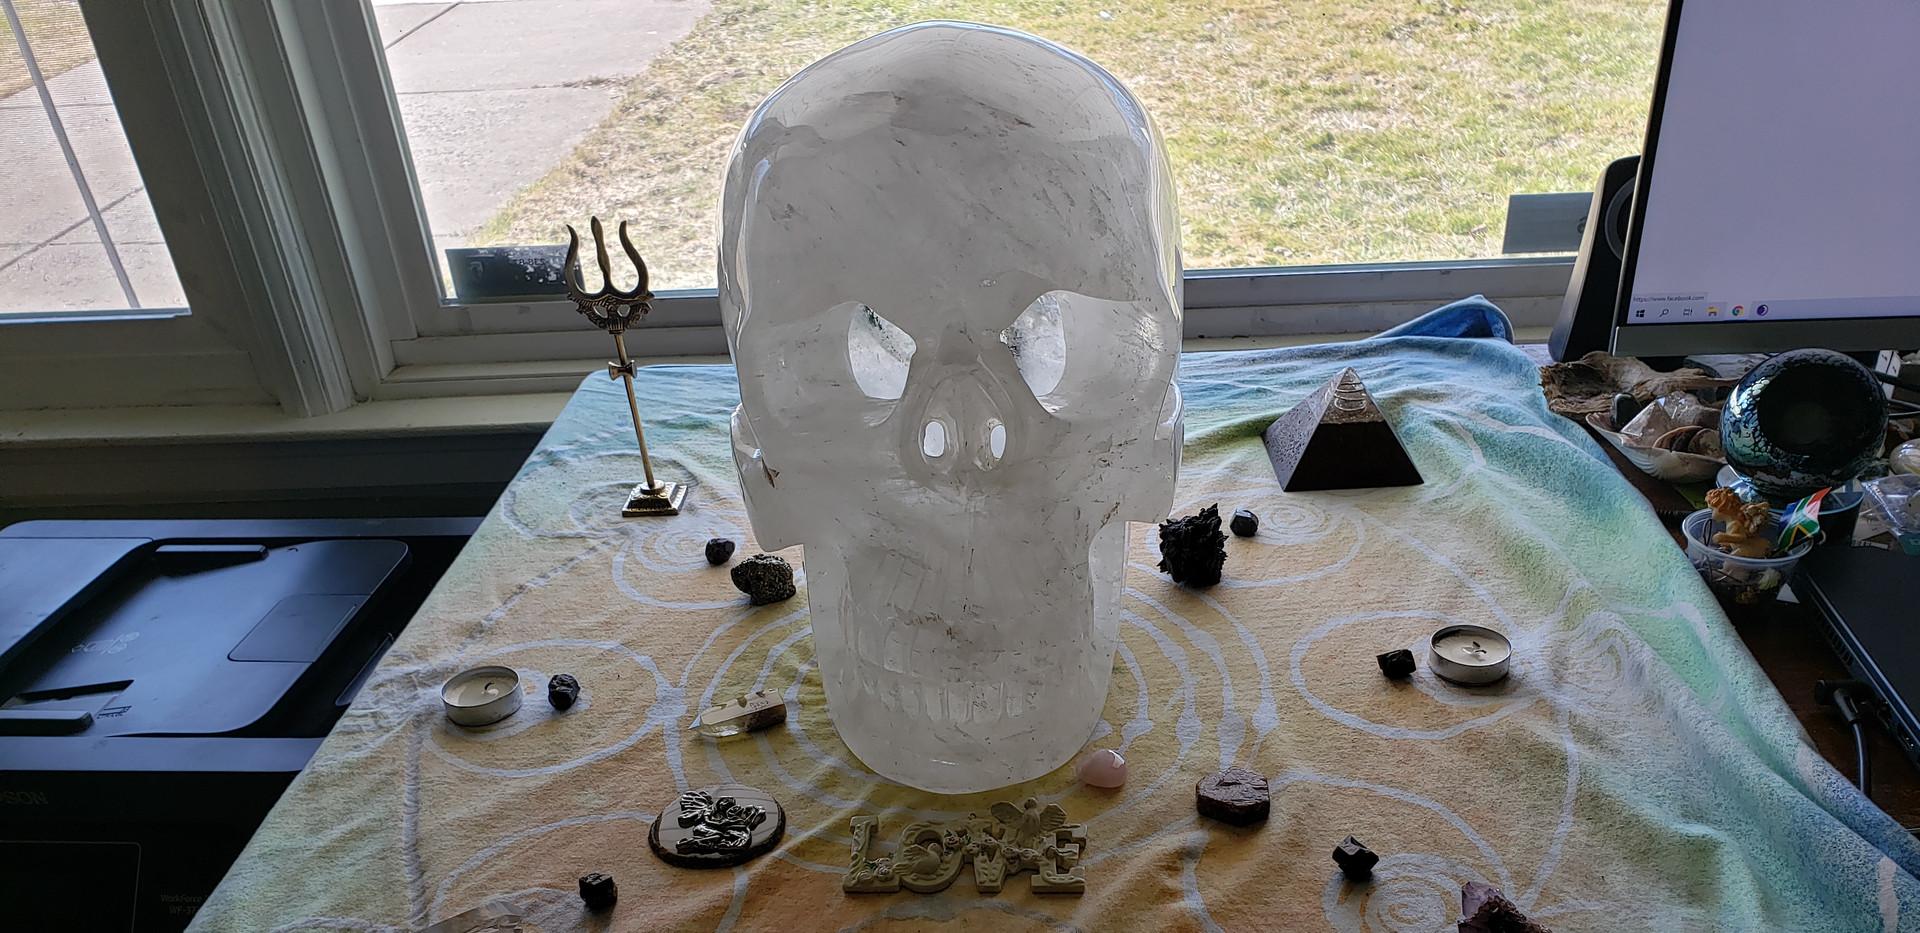 49 pound hollow quartz skull